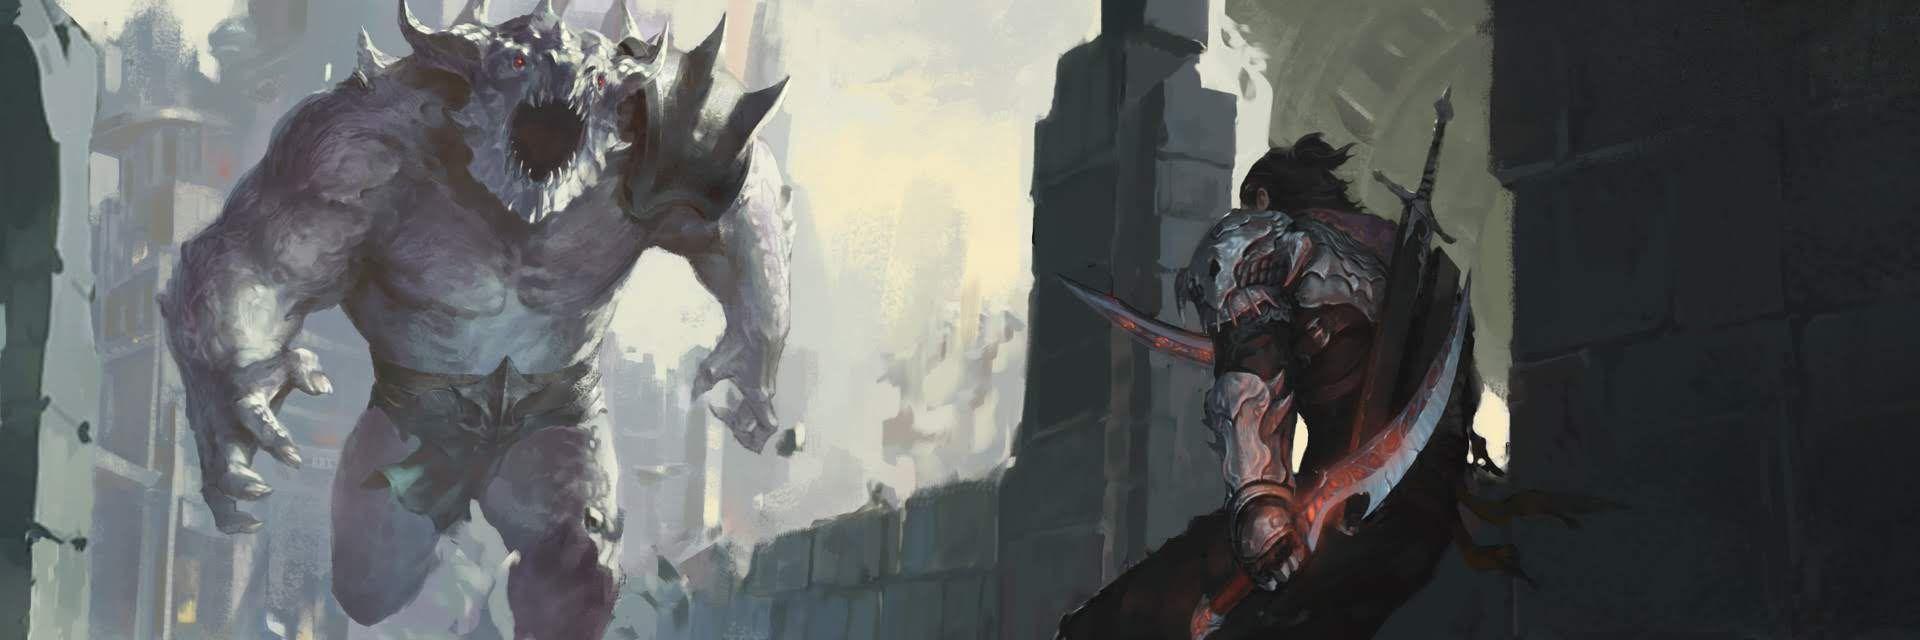 Fantasy Warrior, Artwork, Painting